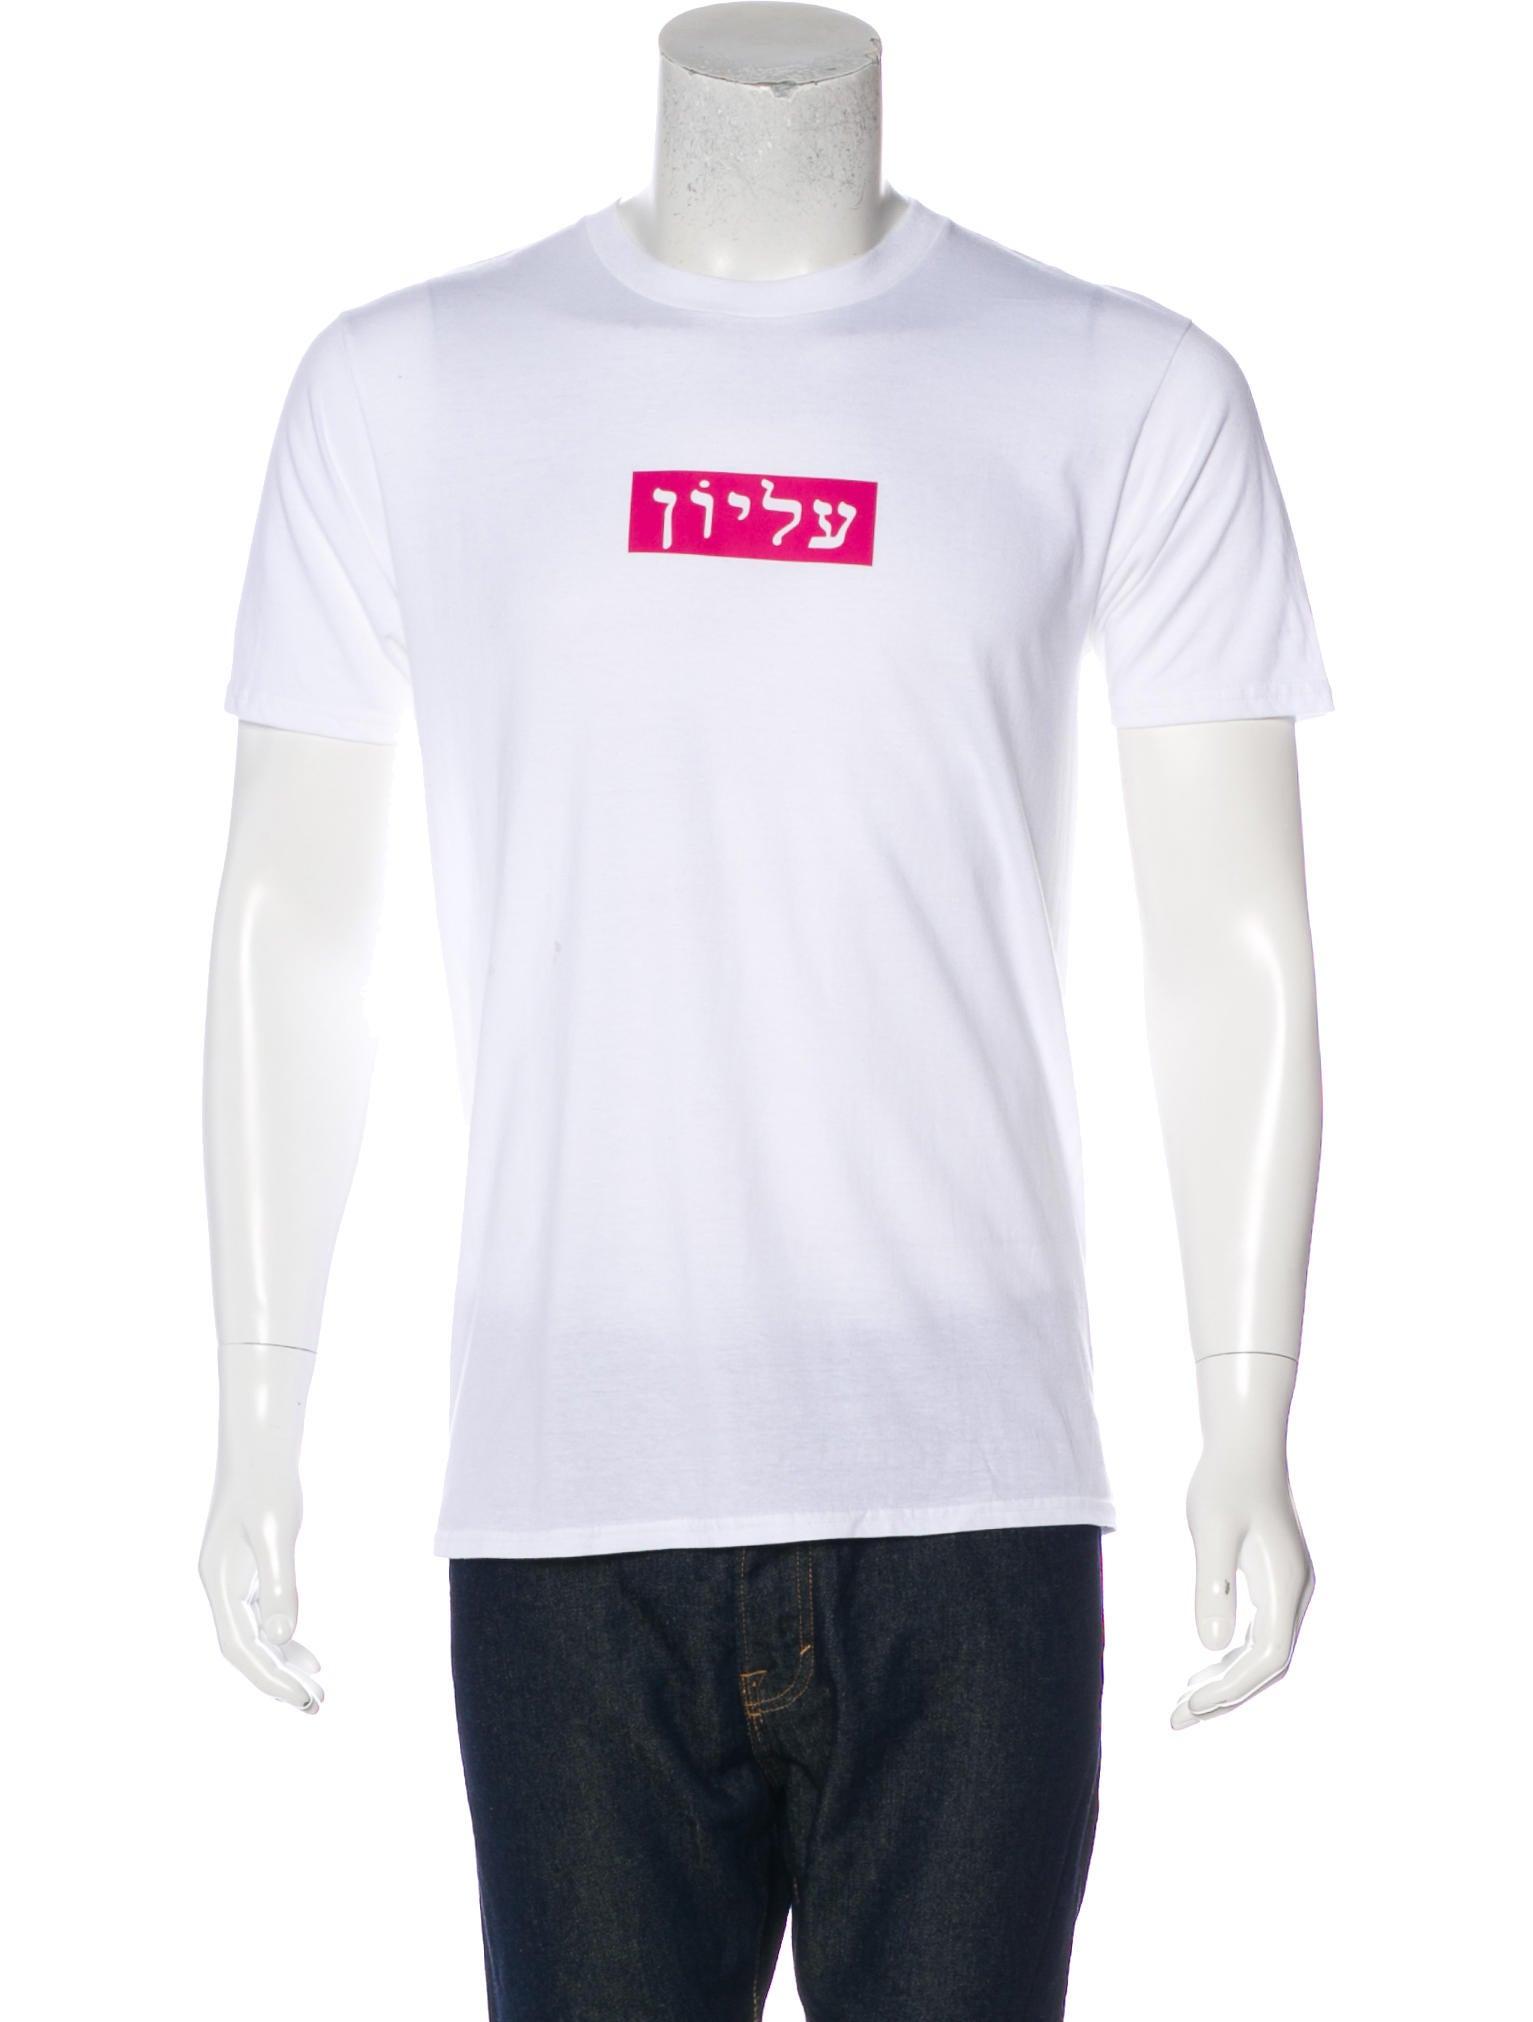 cfd142a39 Supreme Hebrew Box Logo T-Shirt - Clothing - WSPME20652 | The RealReal